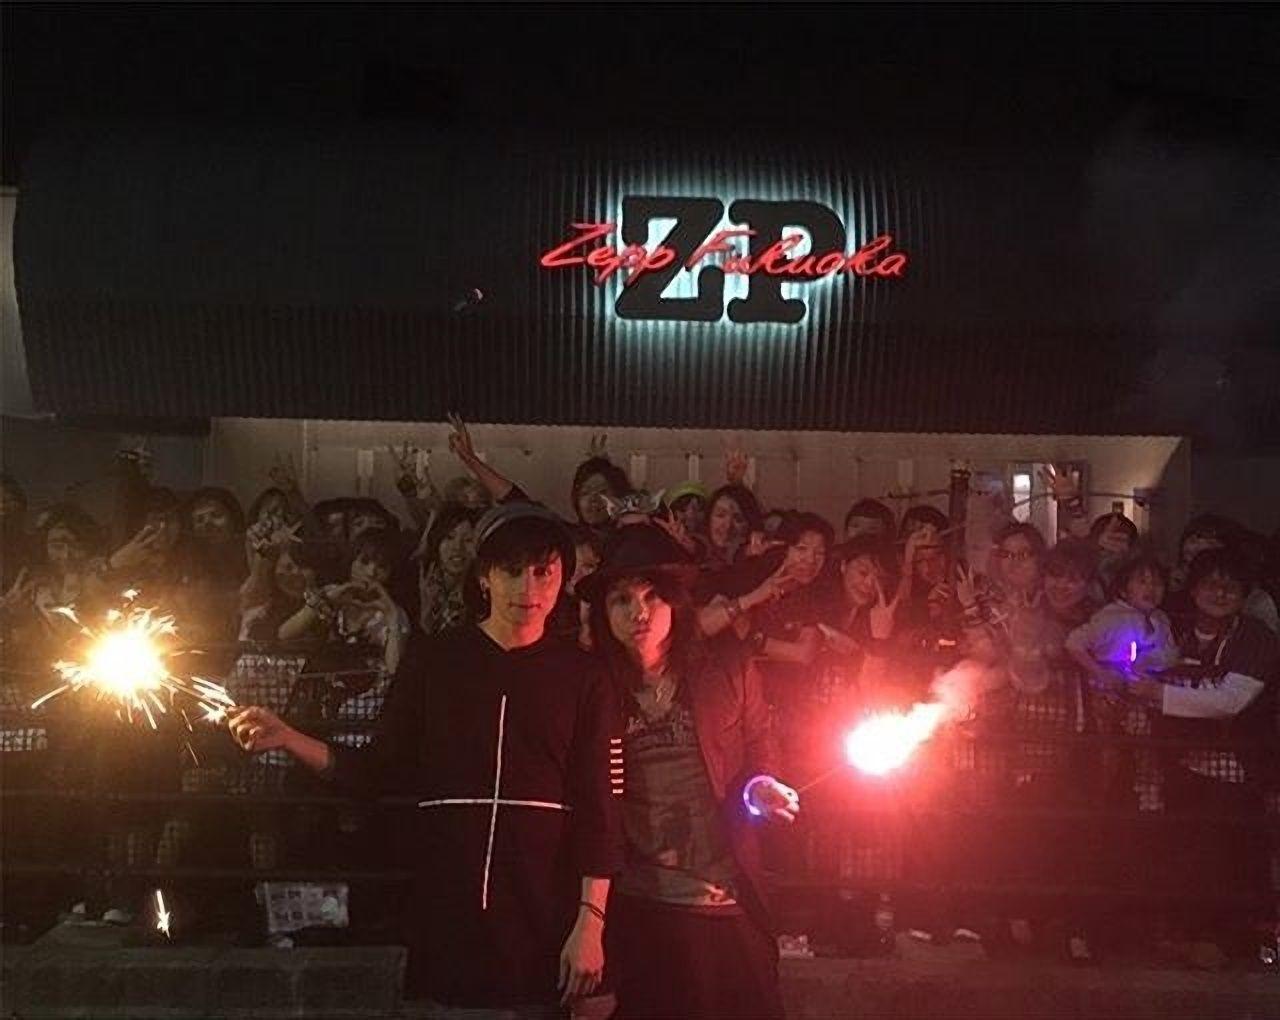 #VAMPS #HYDE #KAZ #VampsLive2016ZeppFukuokaTheFinalParty